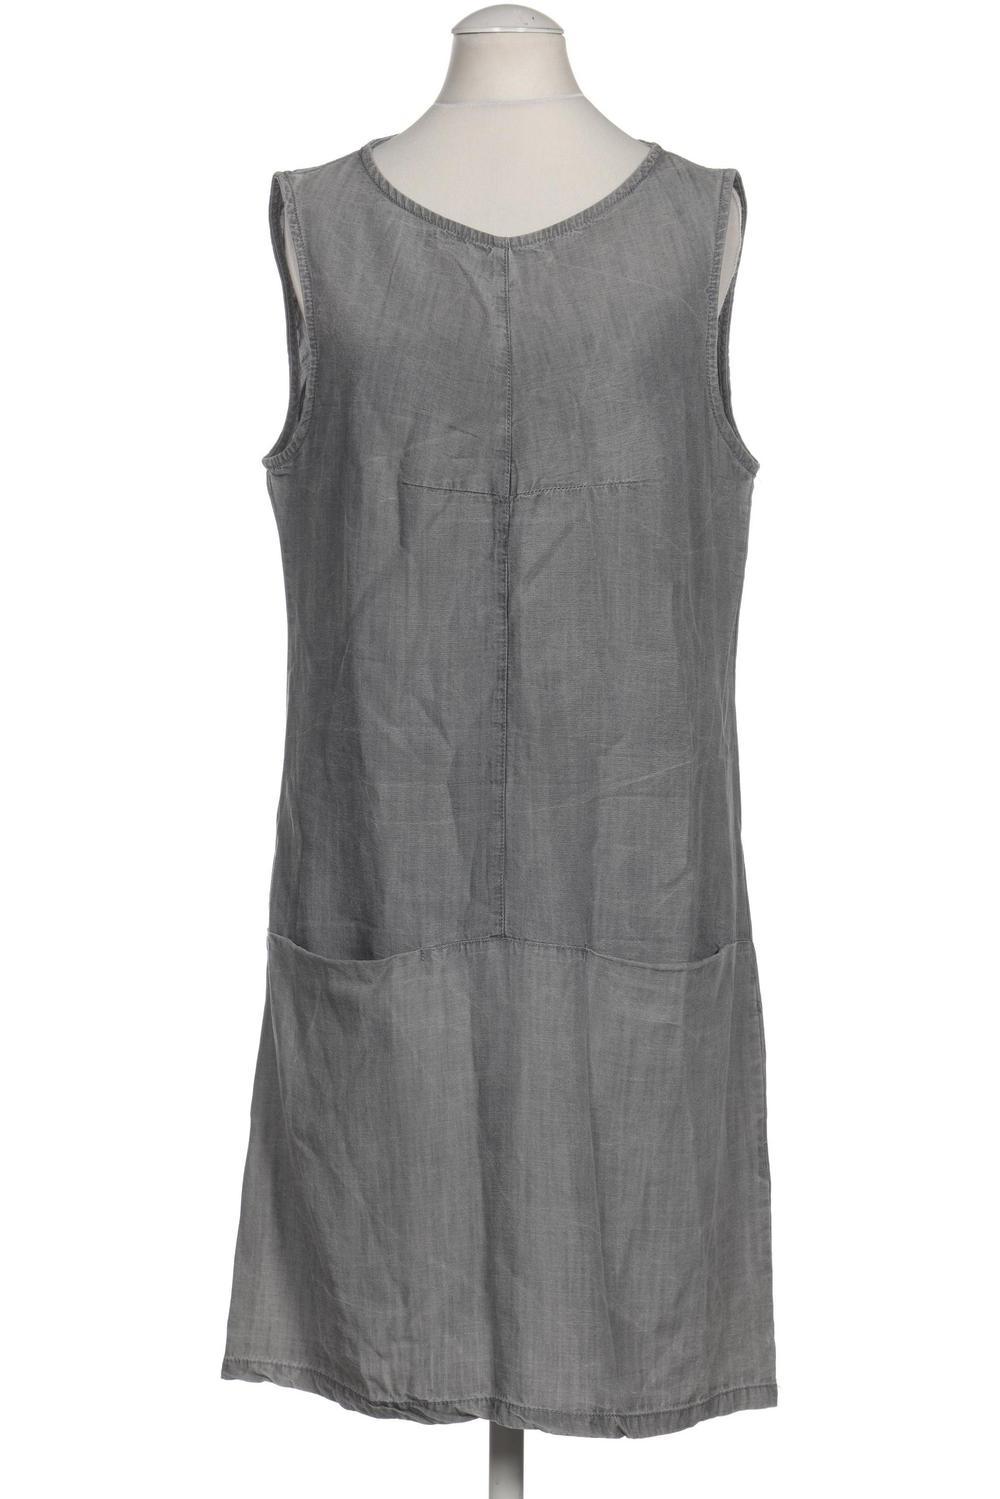 Opus Kleid Damen Dress Damenkleid Gr. DE 36 Viskose grau ...